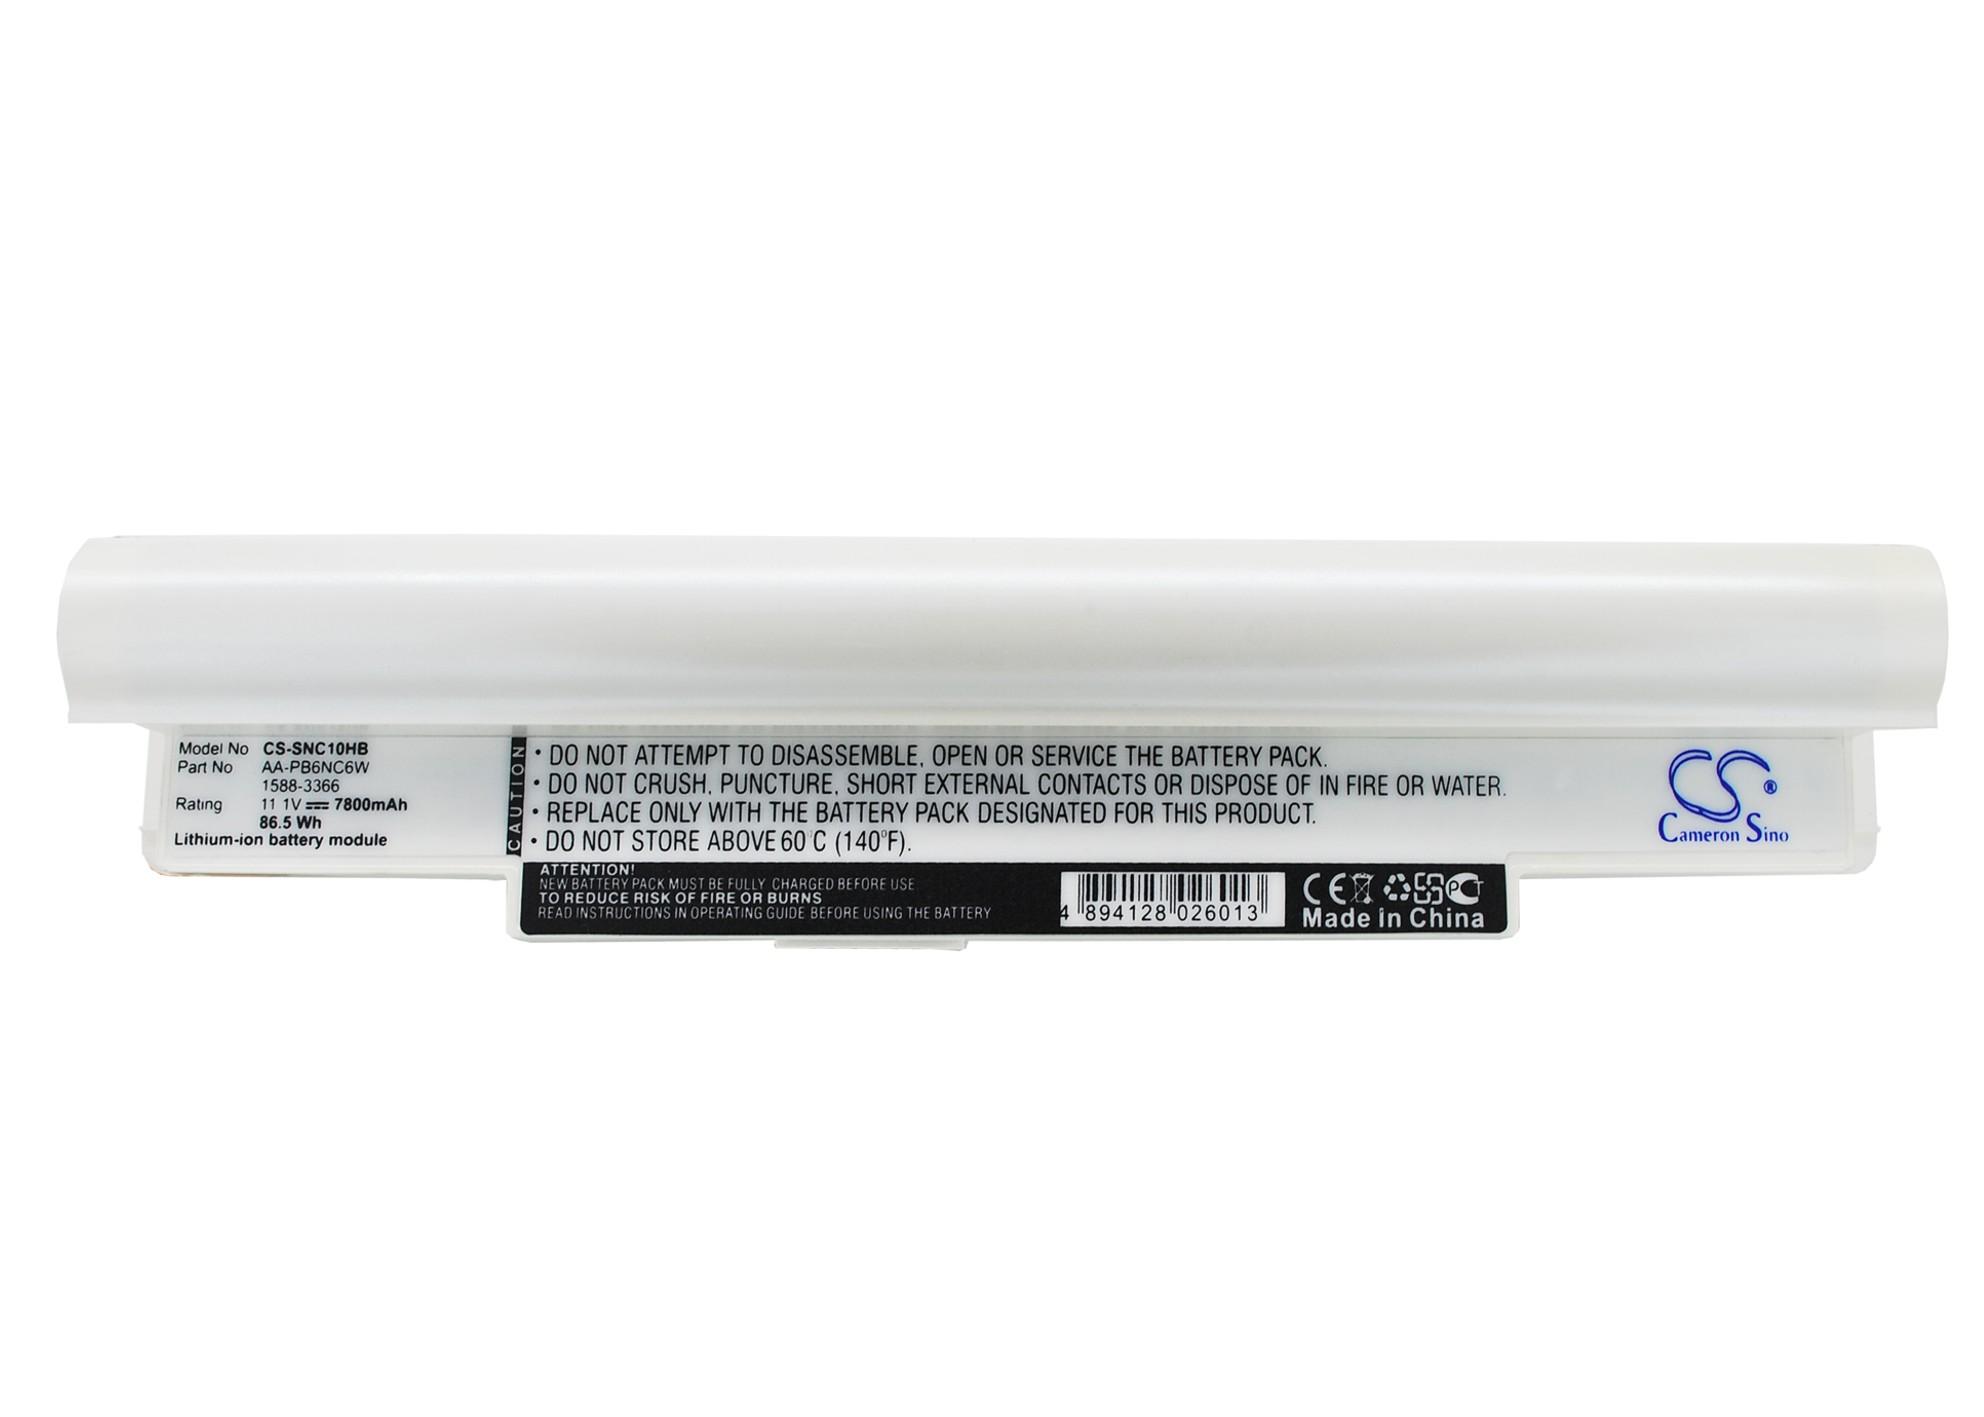 Cameron Sino baterie do notebooků pro SAMSUNG NP-NC20-21GBK 11.1V Li-ion 7800mAh bílá - neoriginální